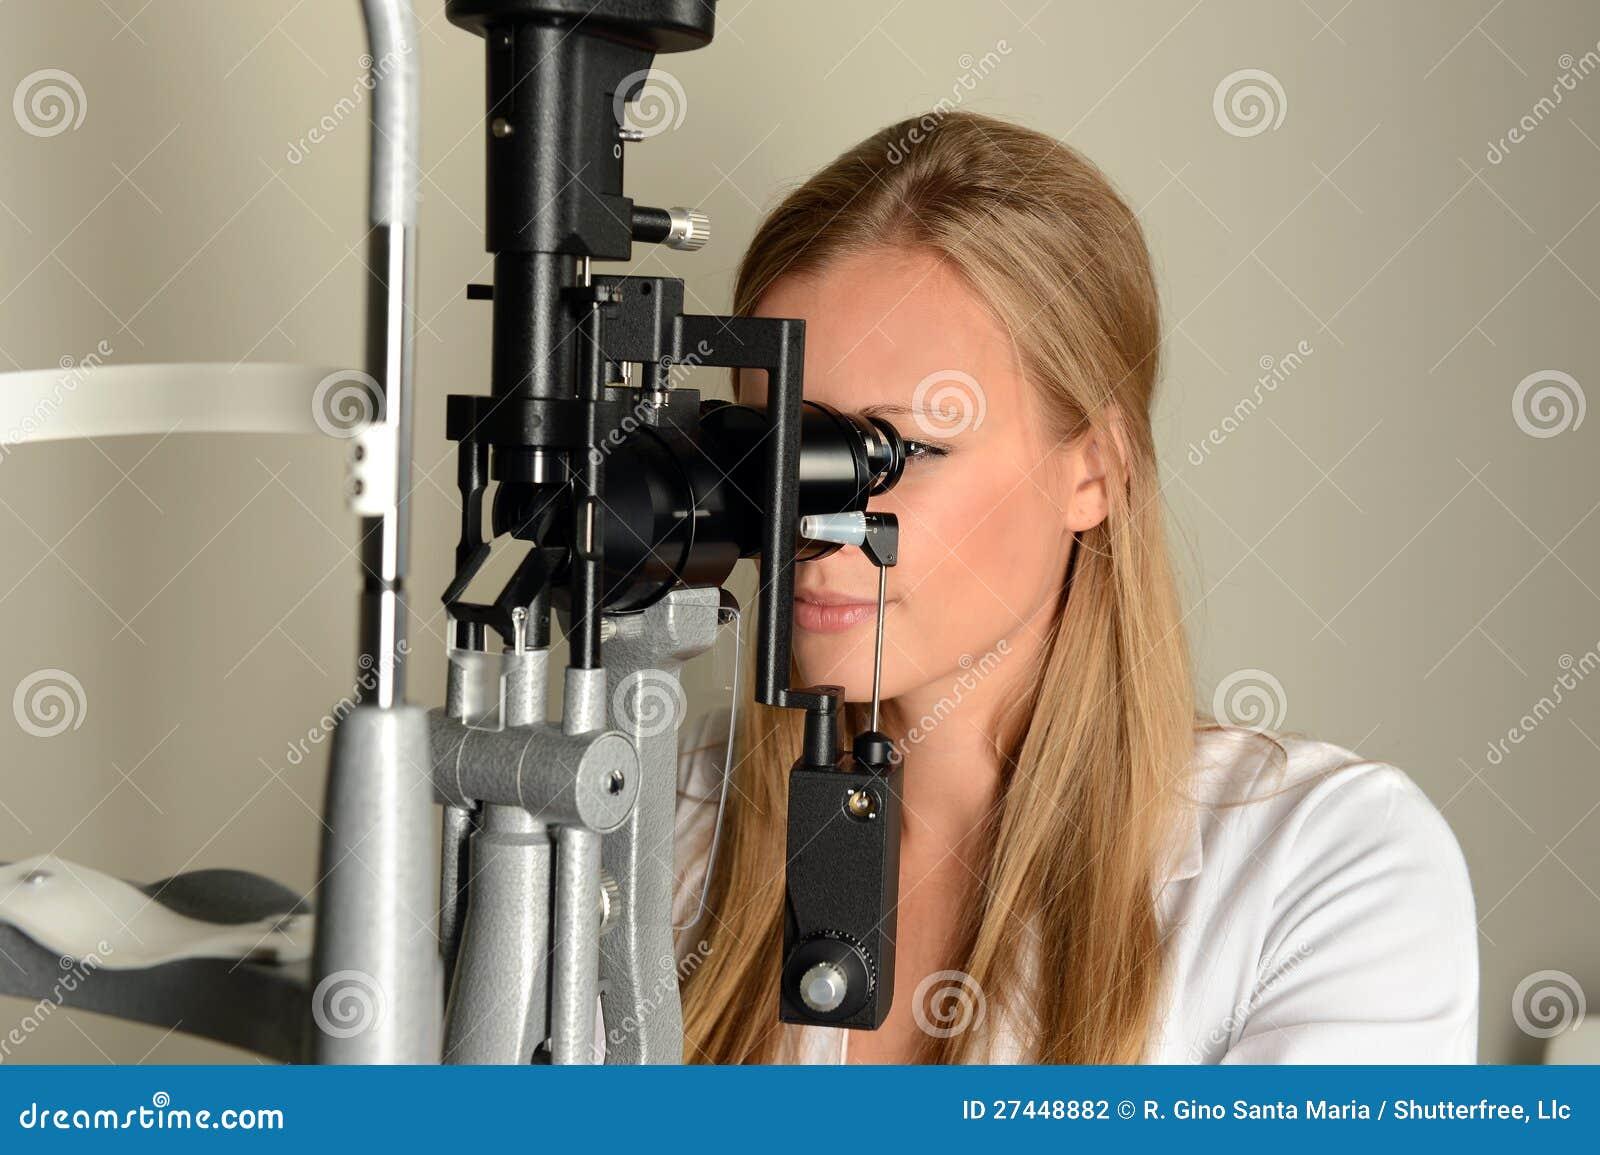 Female Eye Doctor in Examination Room